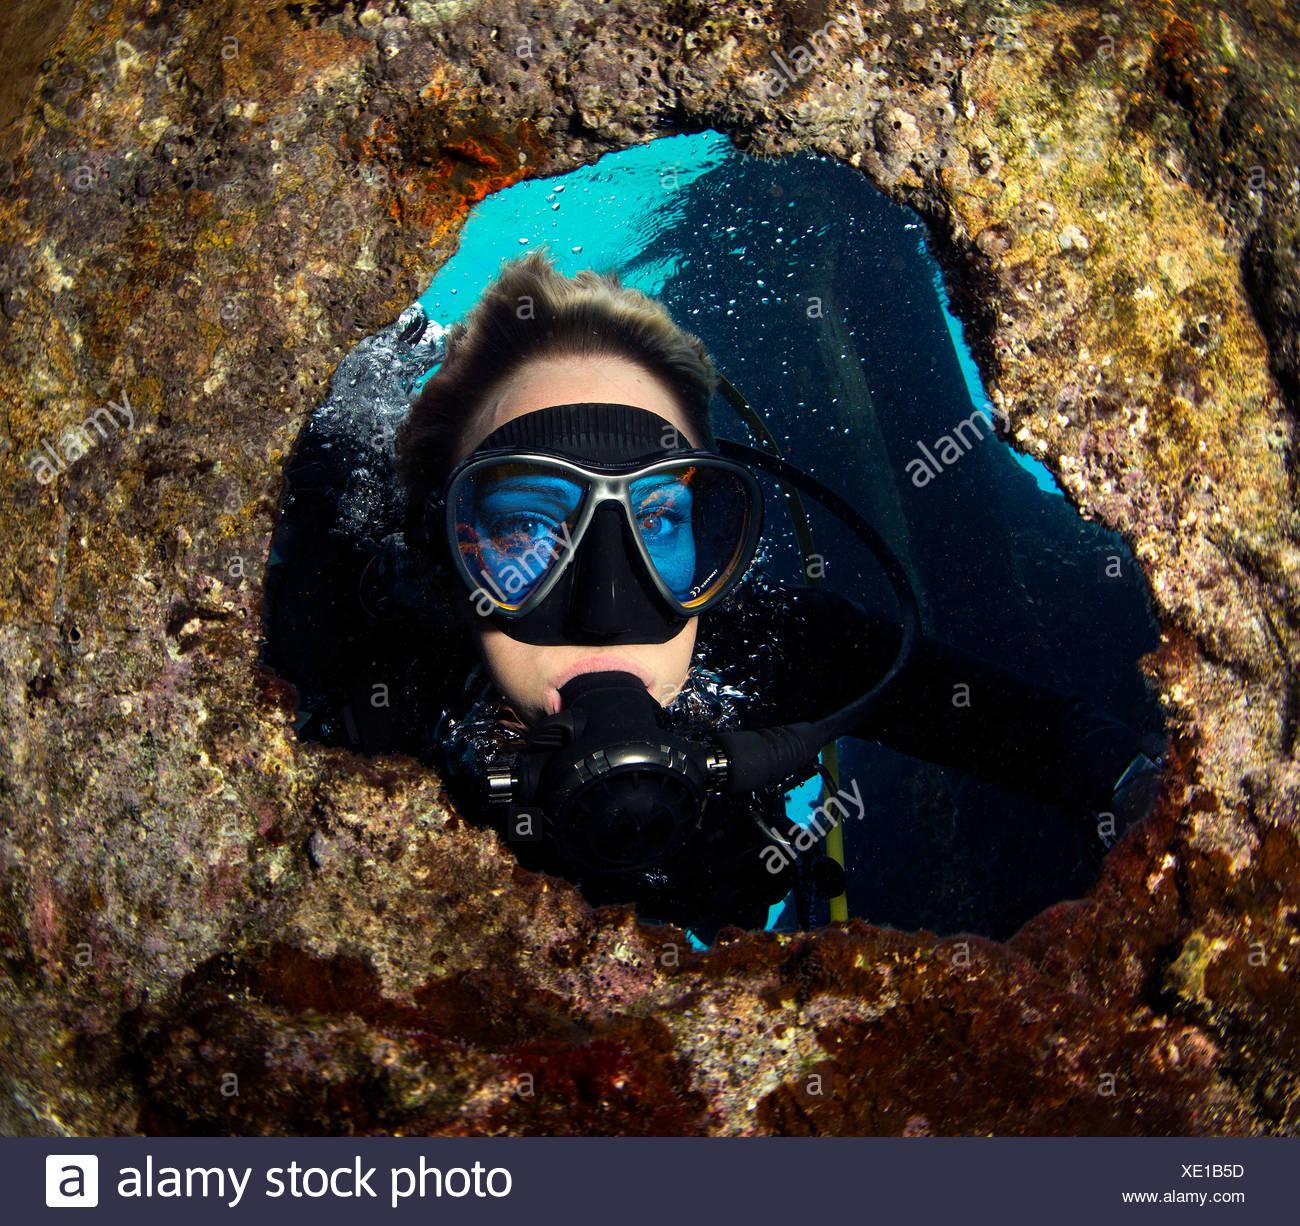 Diver peers through porthole. - Stock Image